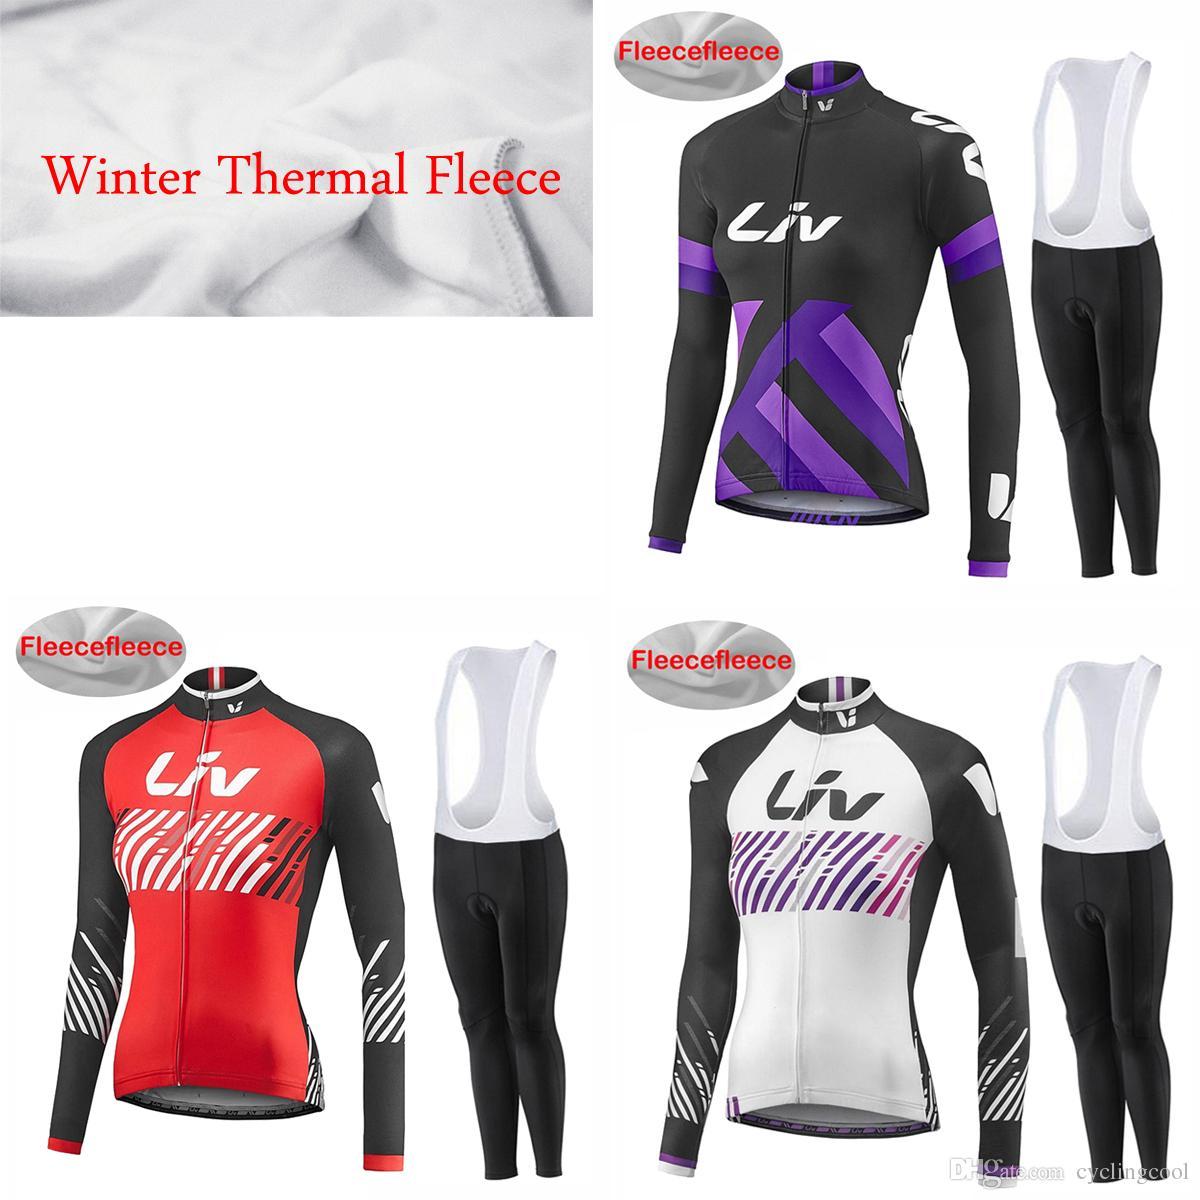 3e8ae7dab 2017 New ! Liv Team Women S Cycling Jerseys Set